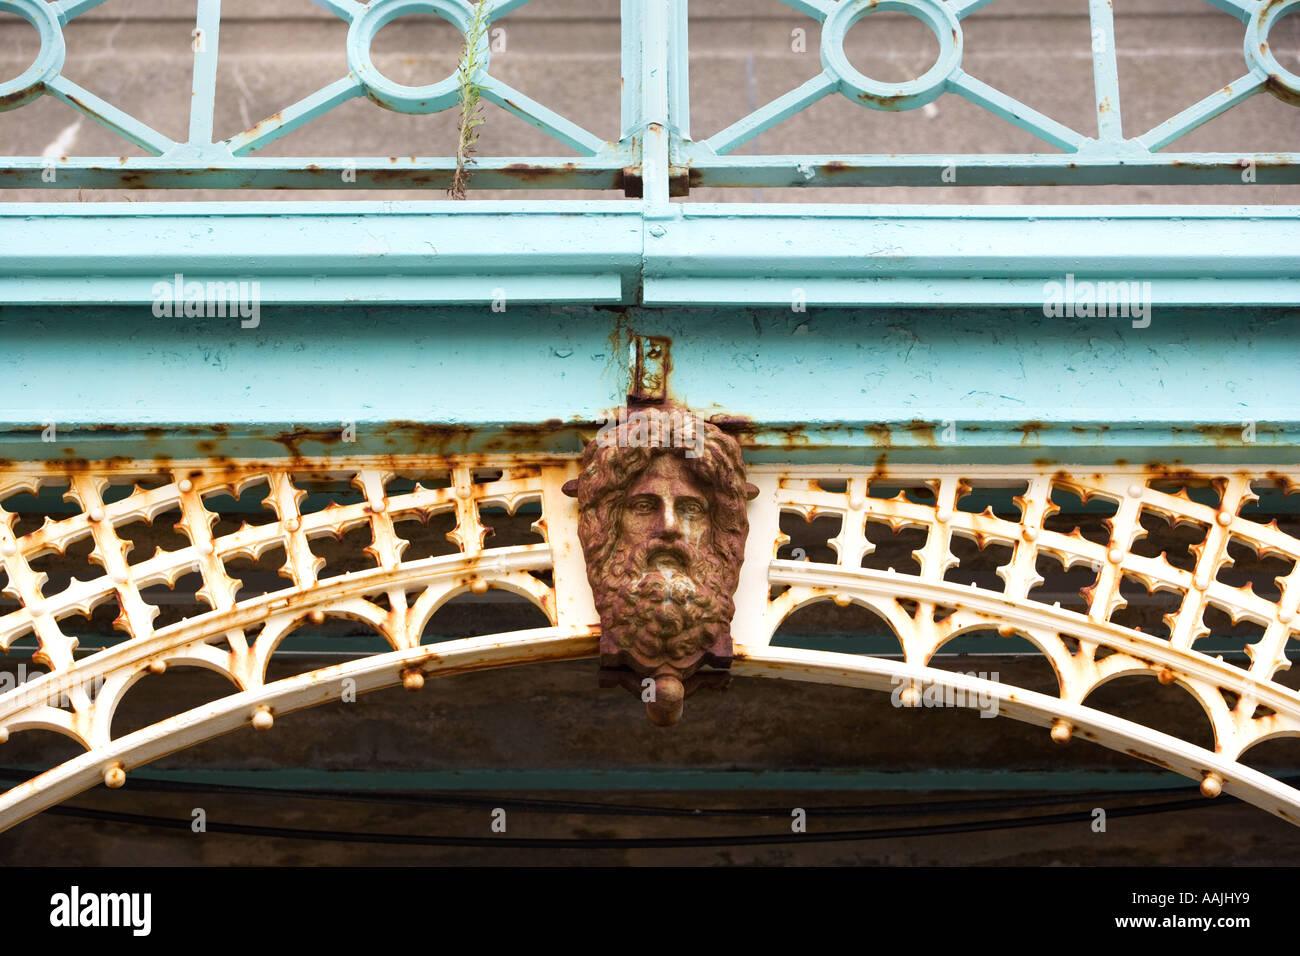 Metal figurehead on cast iron railings in Brighton England - Stock Image